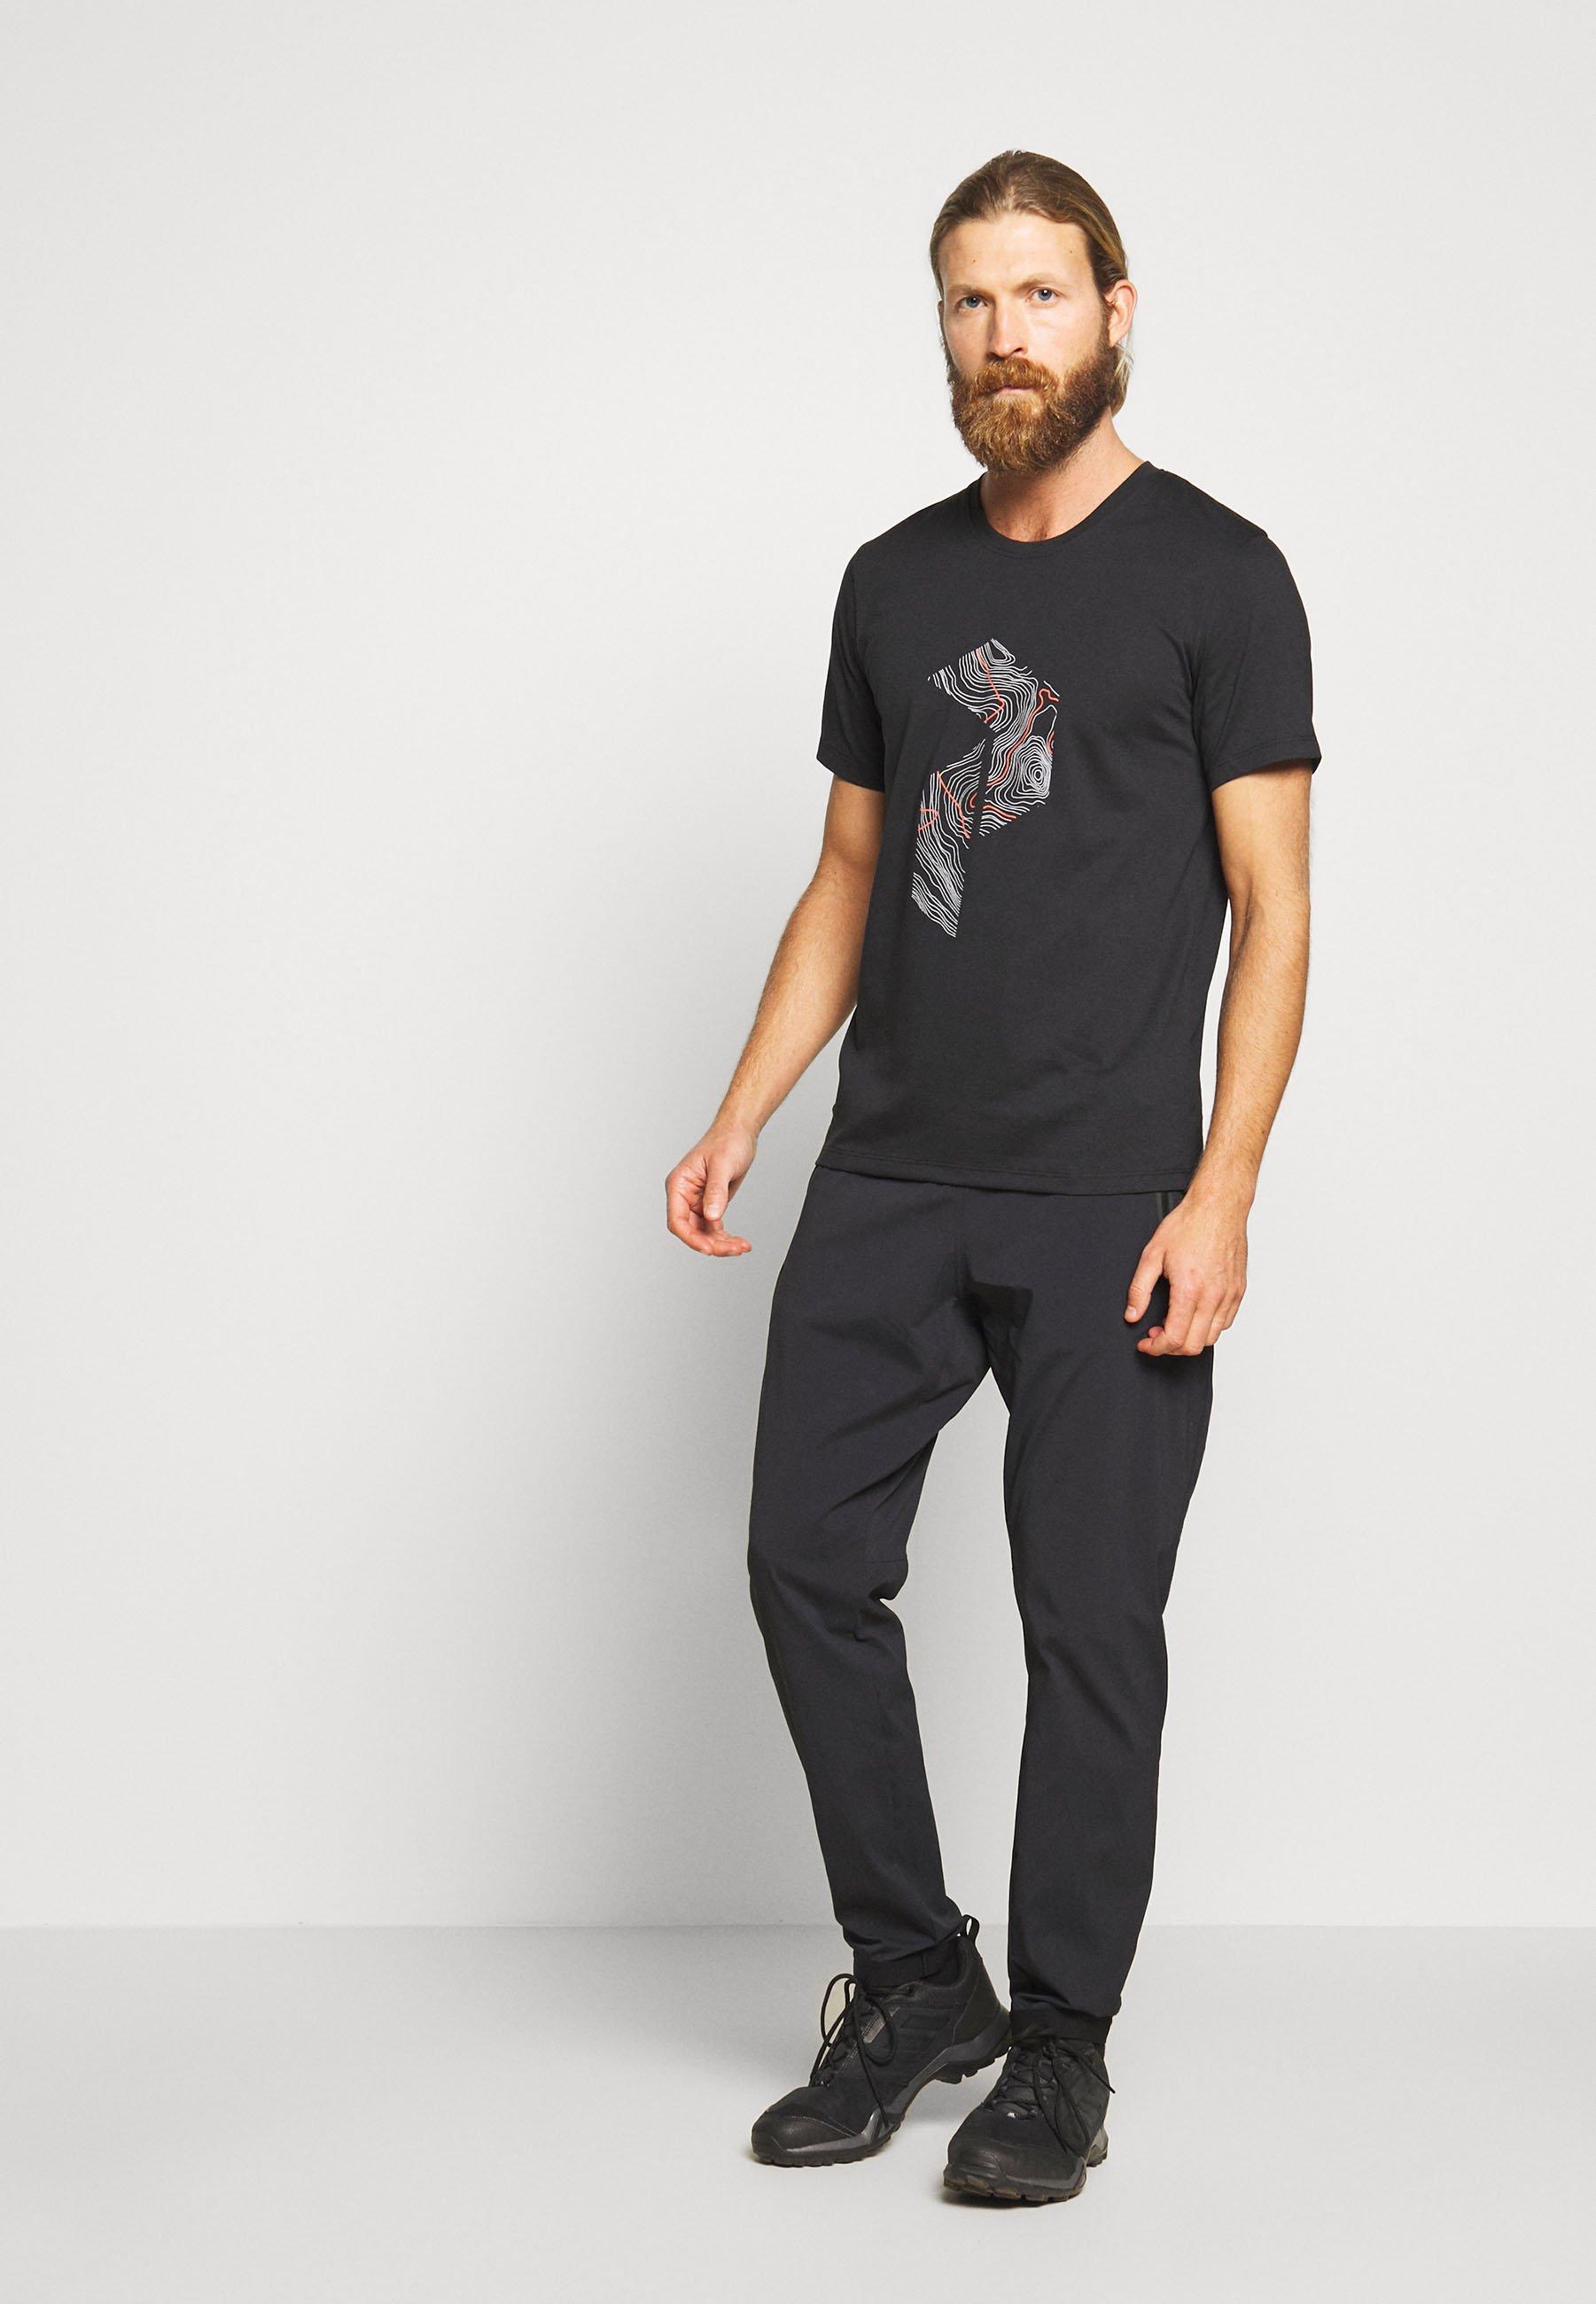 Peak Performance Explore Tee Print - T-shirt Con Stampa Black WWK38